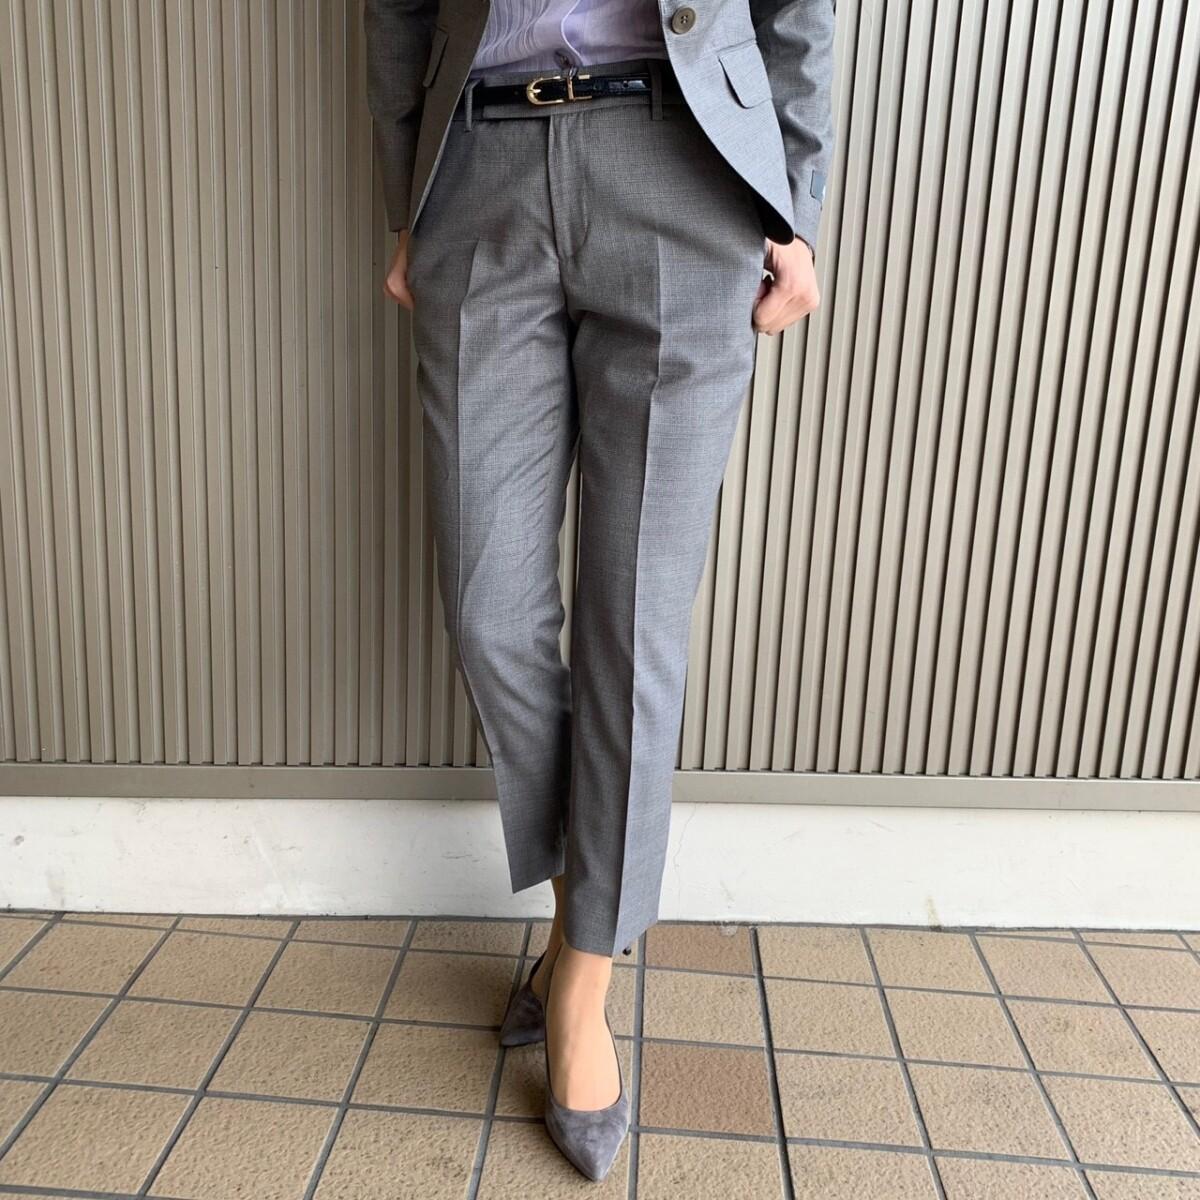 《recommend》イタリアREDA社の上質ウールスーツ☆☆